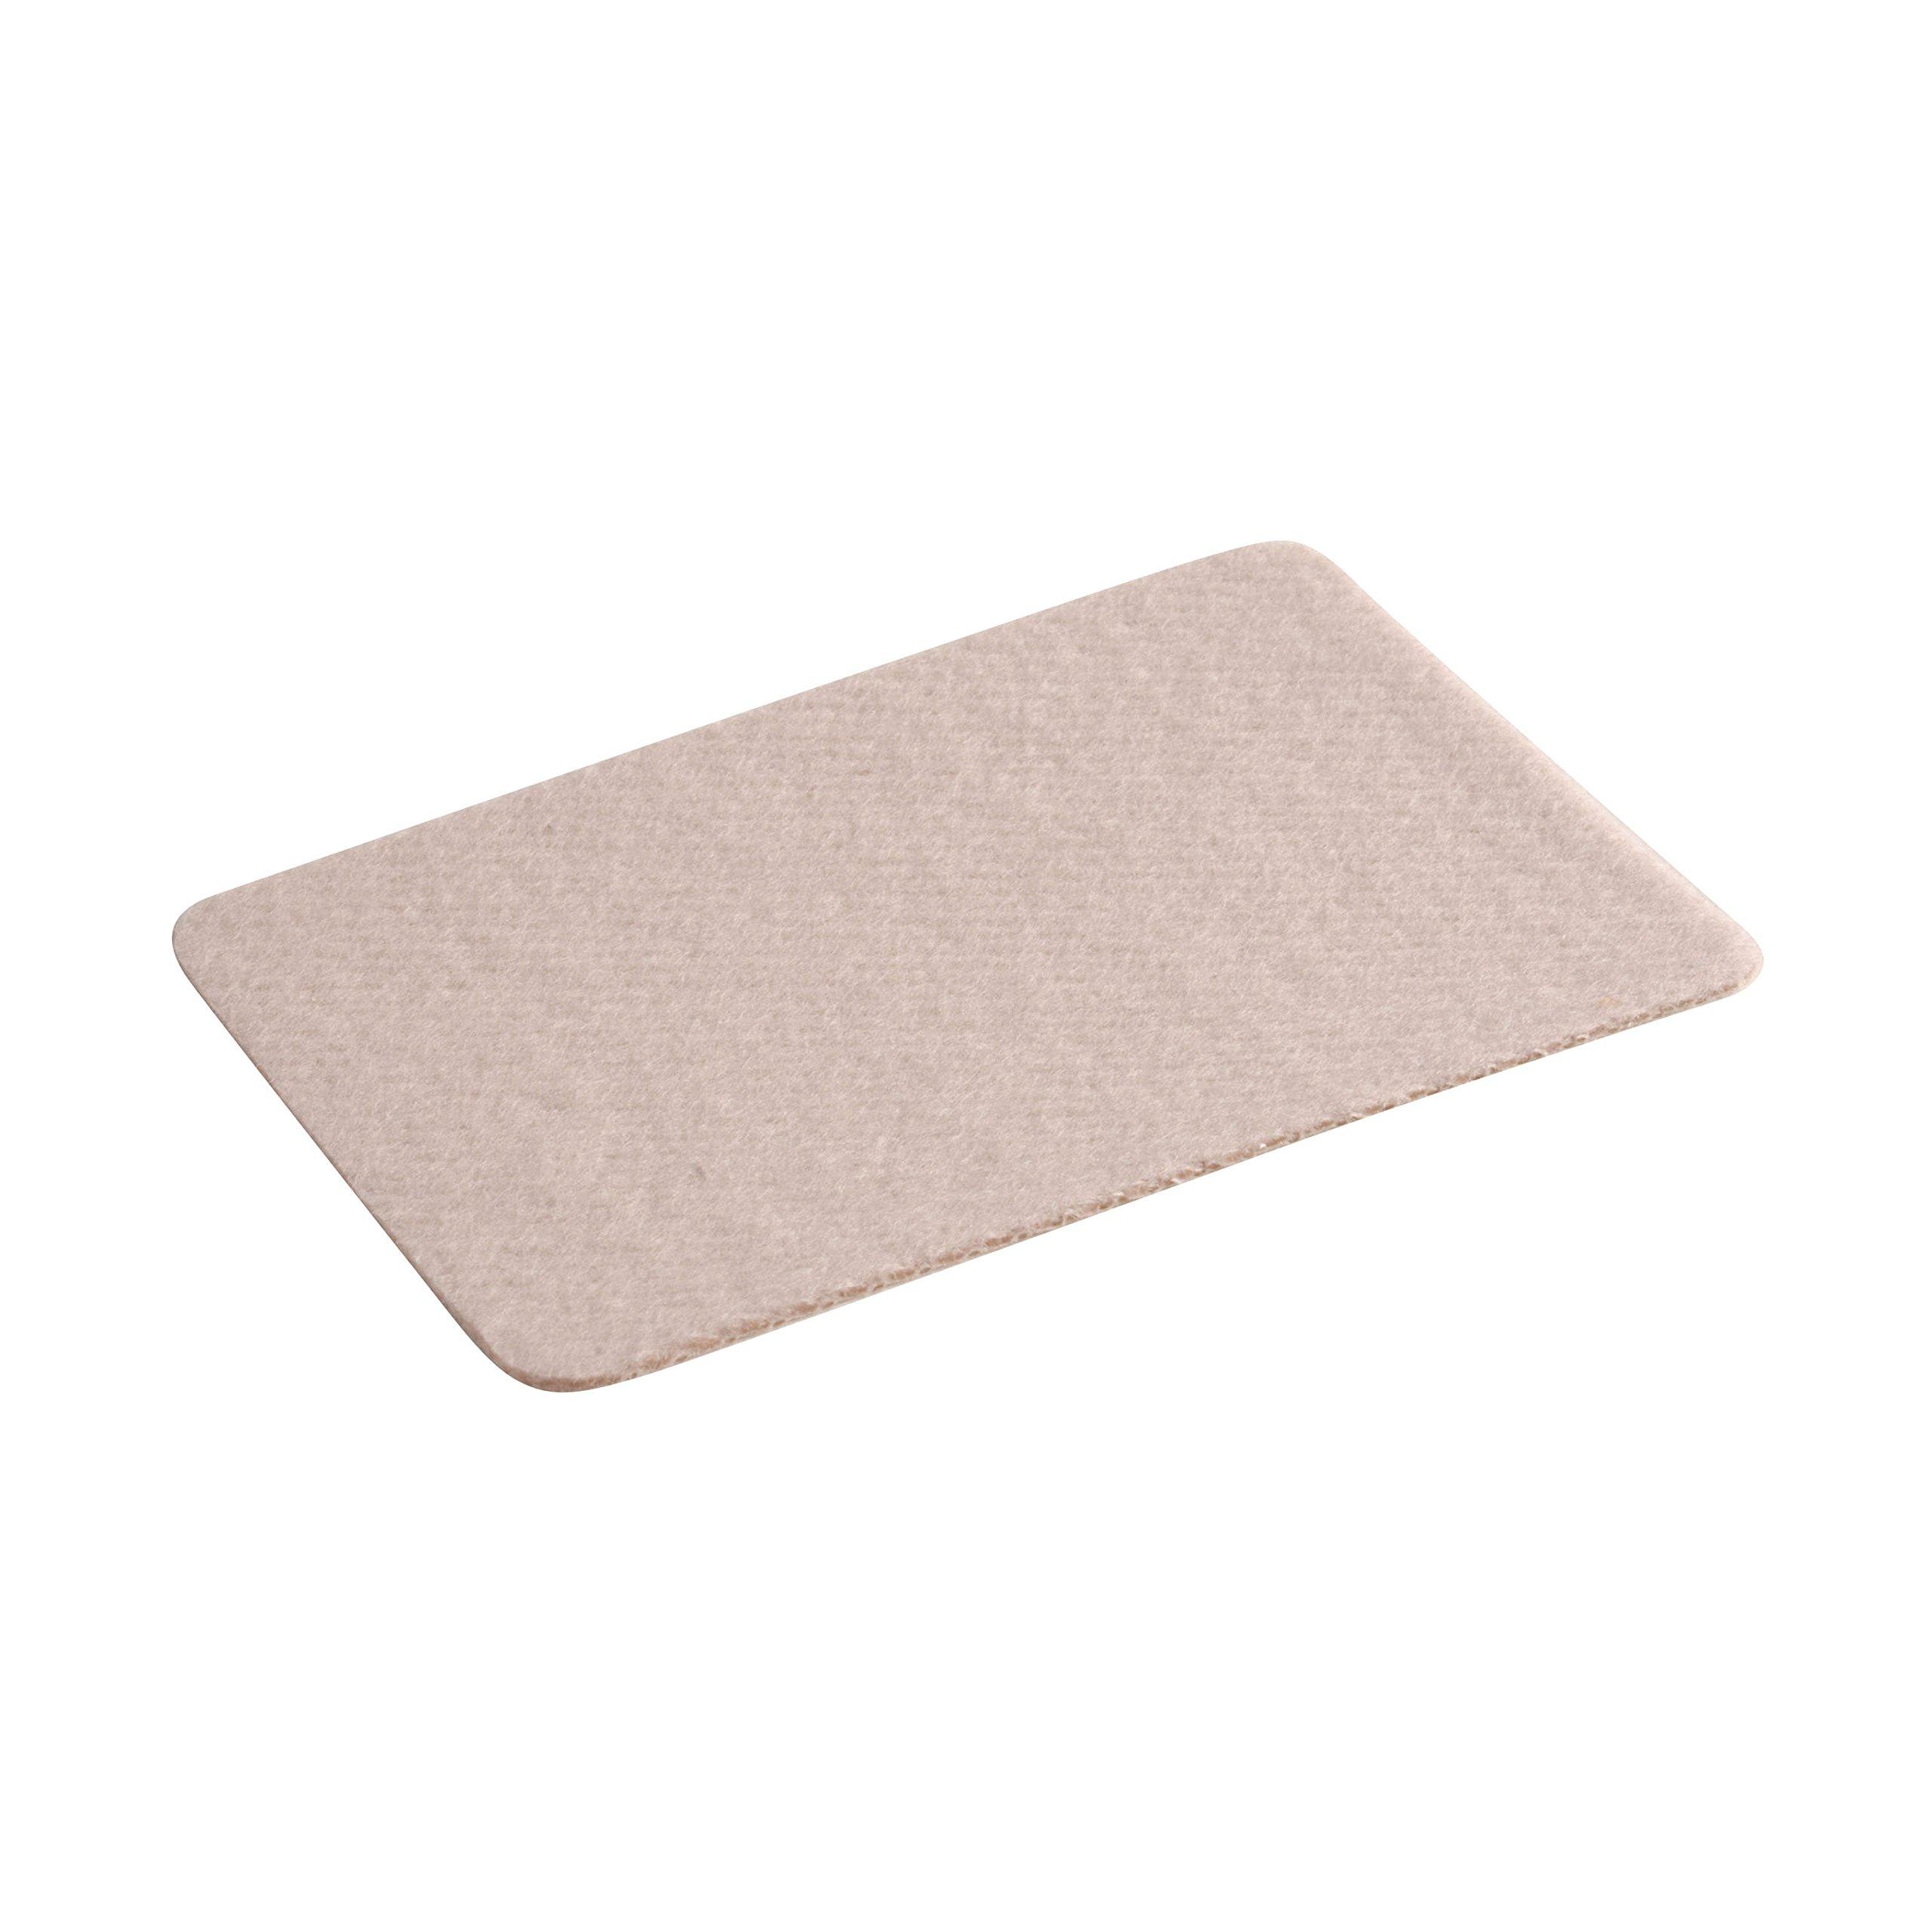 Steins 2 X 3 Inch Moleskin Sheets - Moleskin Foot Pads, 5 Count